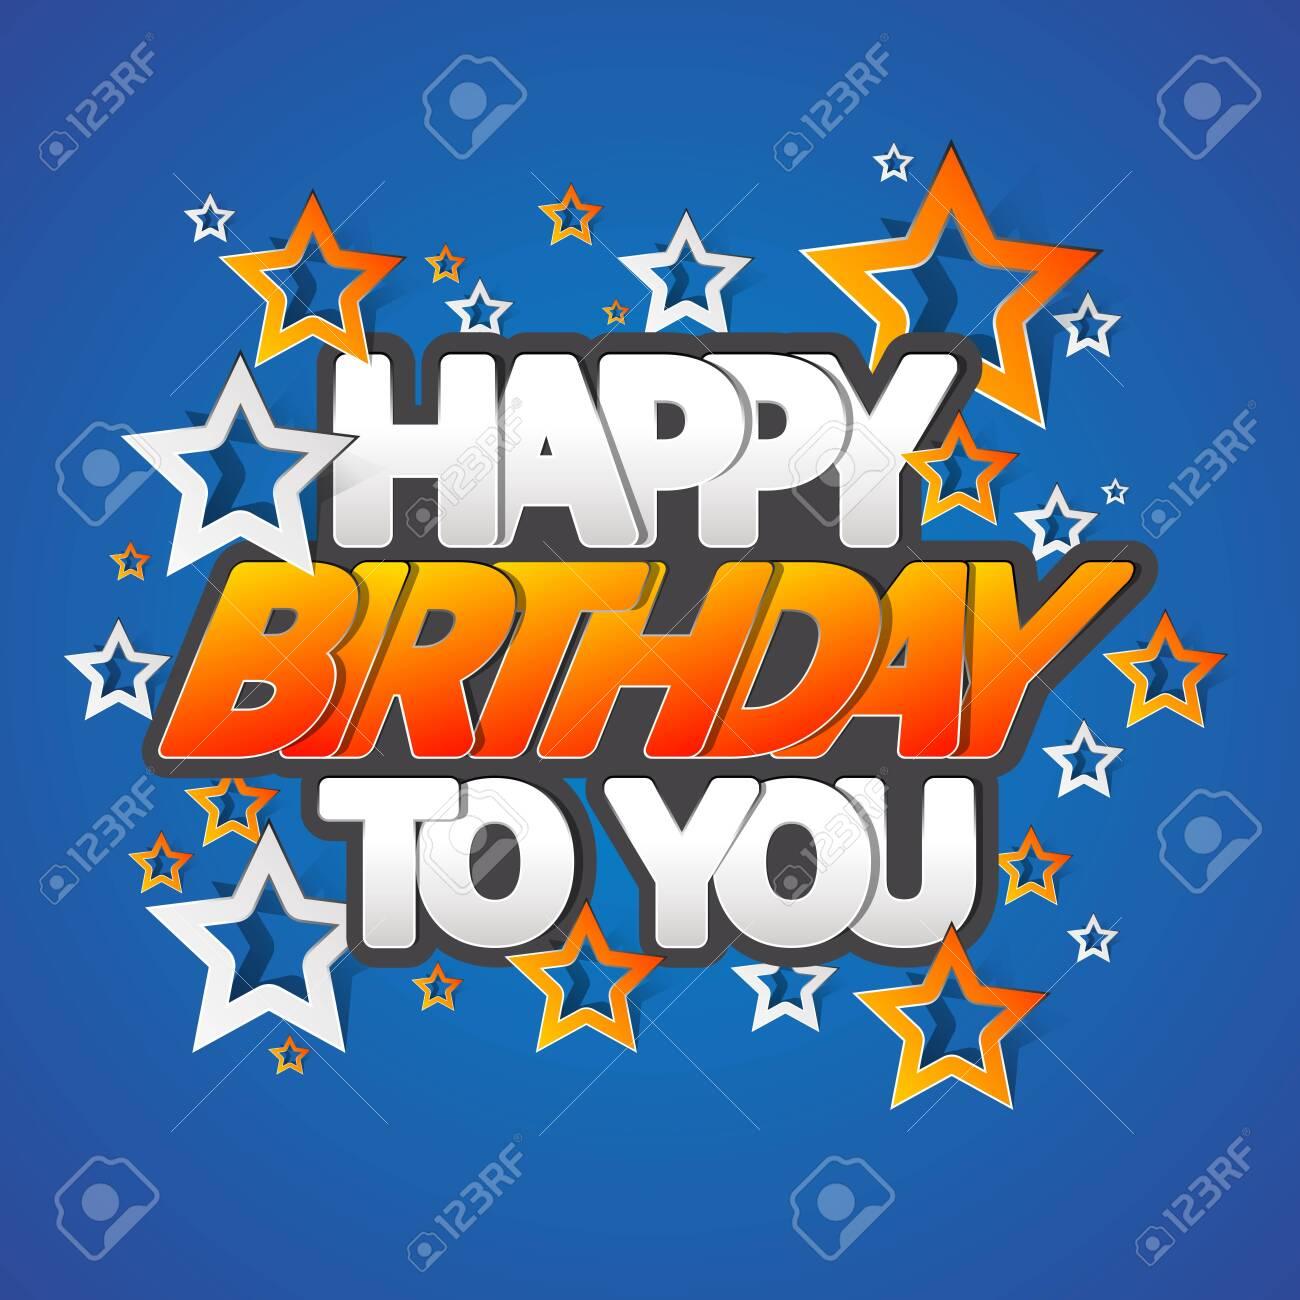 Happy Birthday Greeting Card Vector Illustration - 149515035